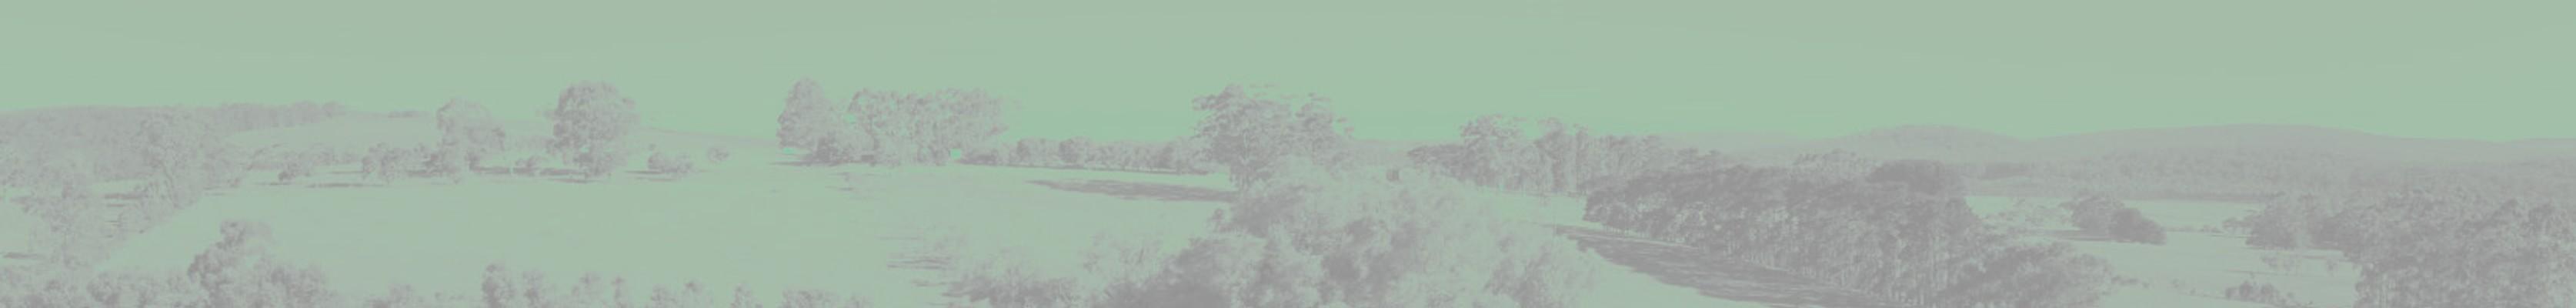 f0006-01